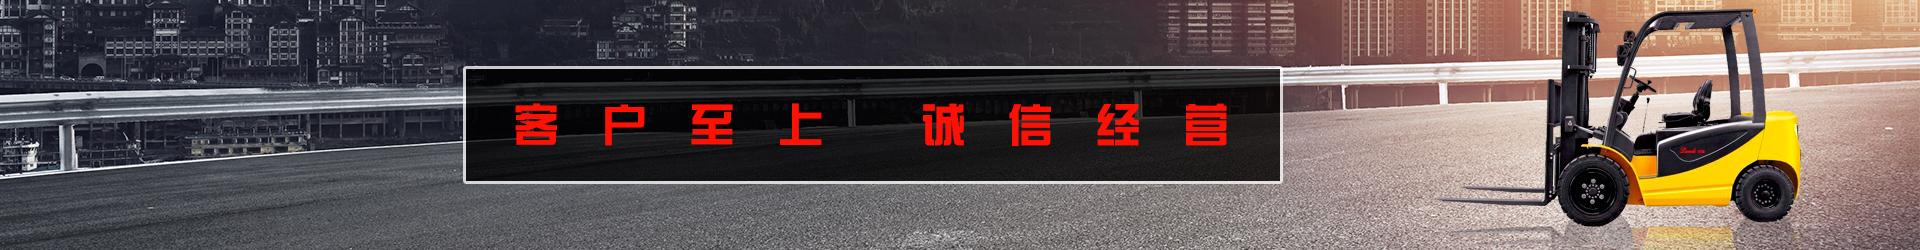 http://www.hajyqz.com/data/upload/202011/20201116135327_821.jpg